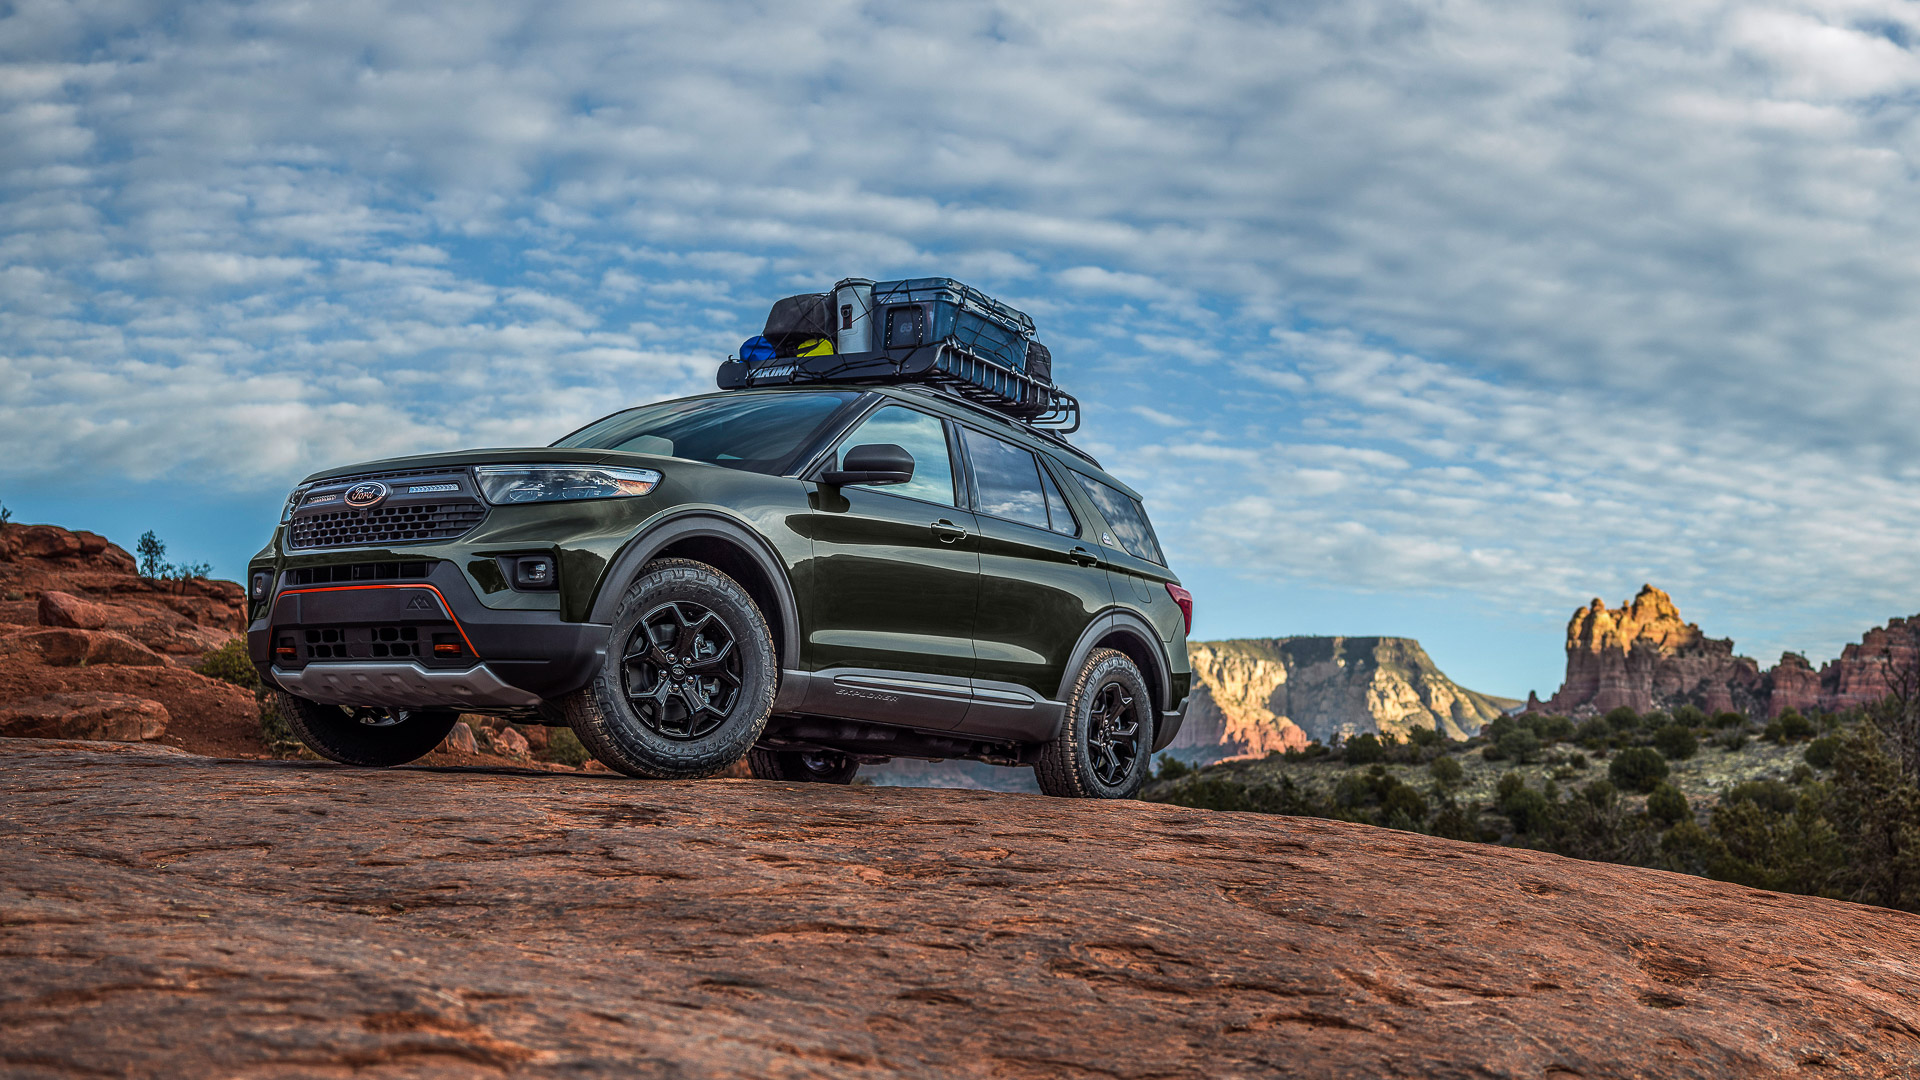 2021 Ford Explorer Timberline: 7-Passenger Off-Road Adventure Machine